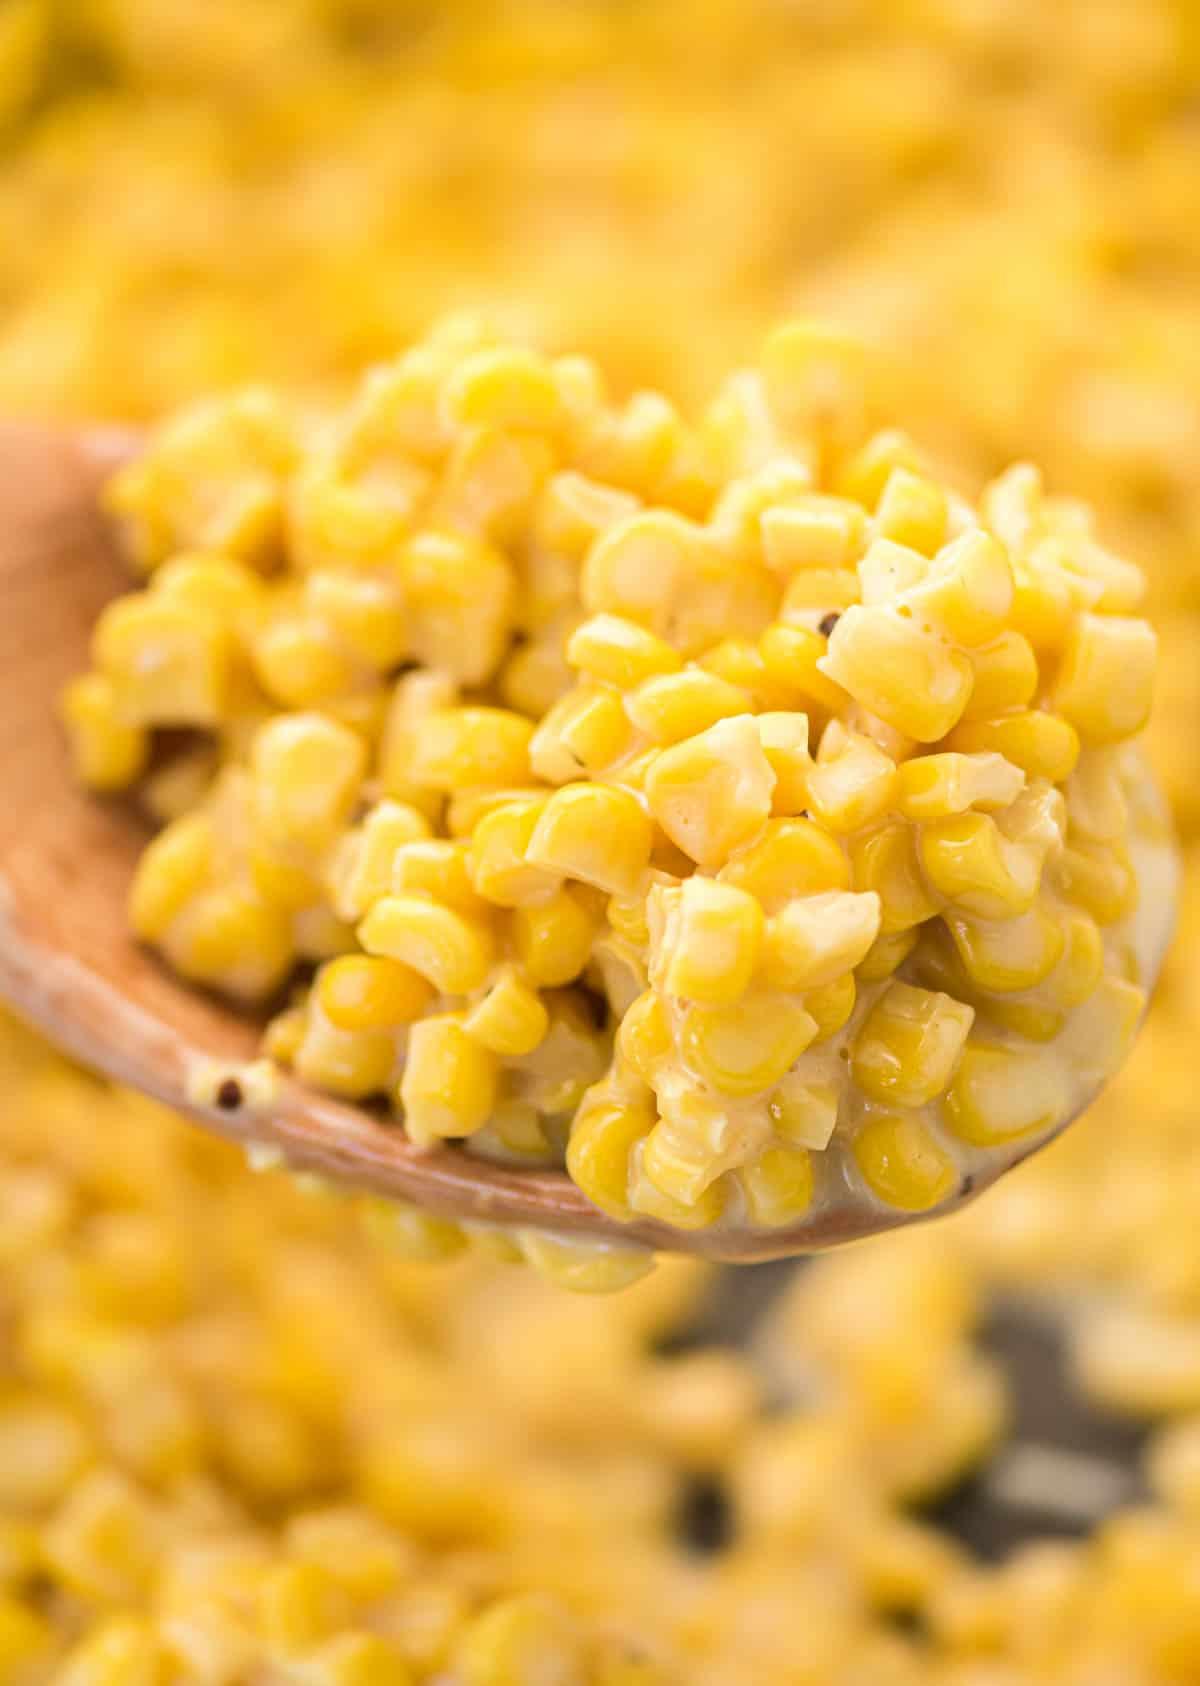 creamy corn on a wooden spoon